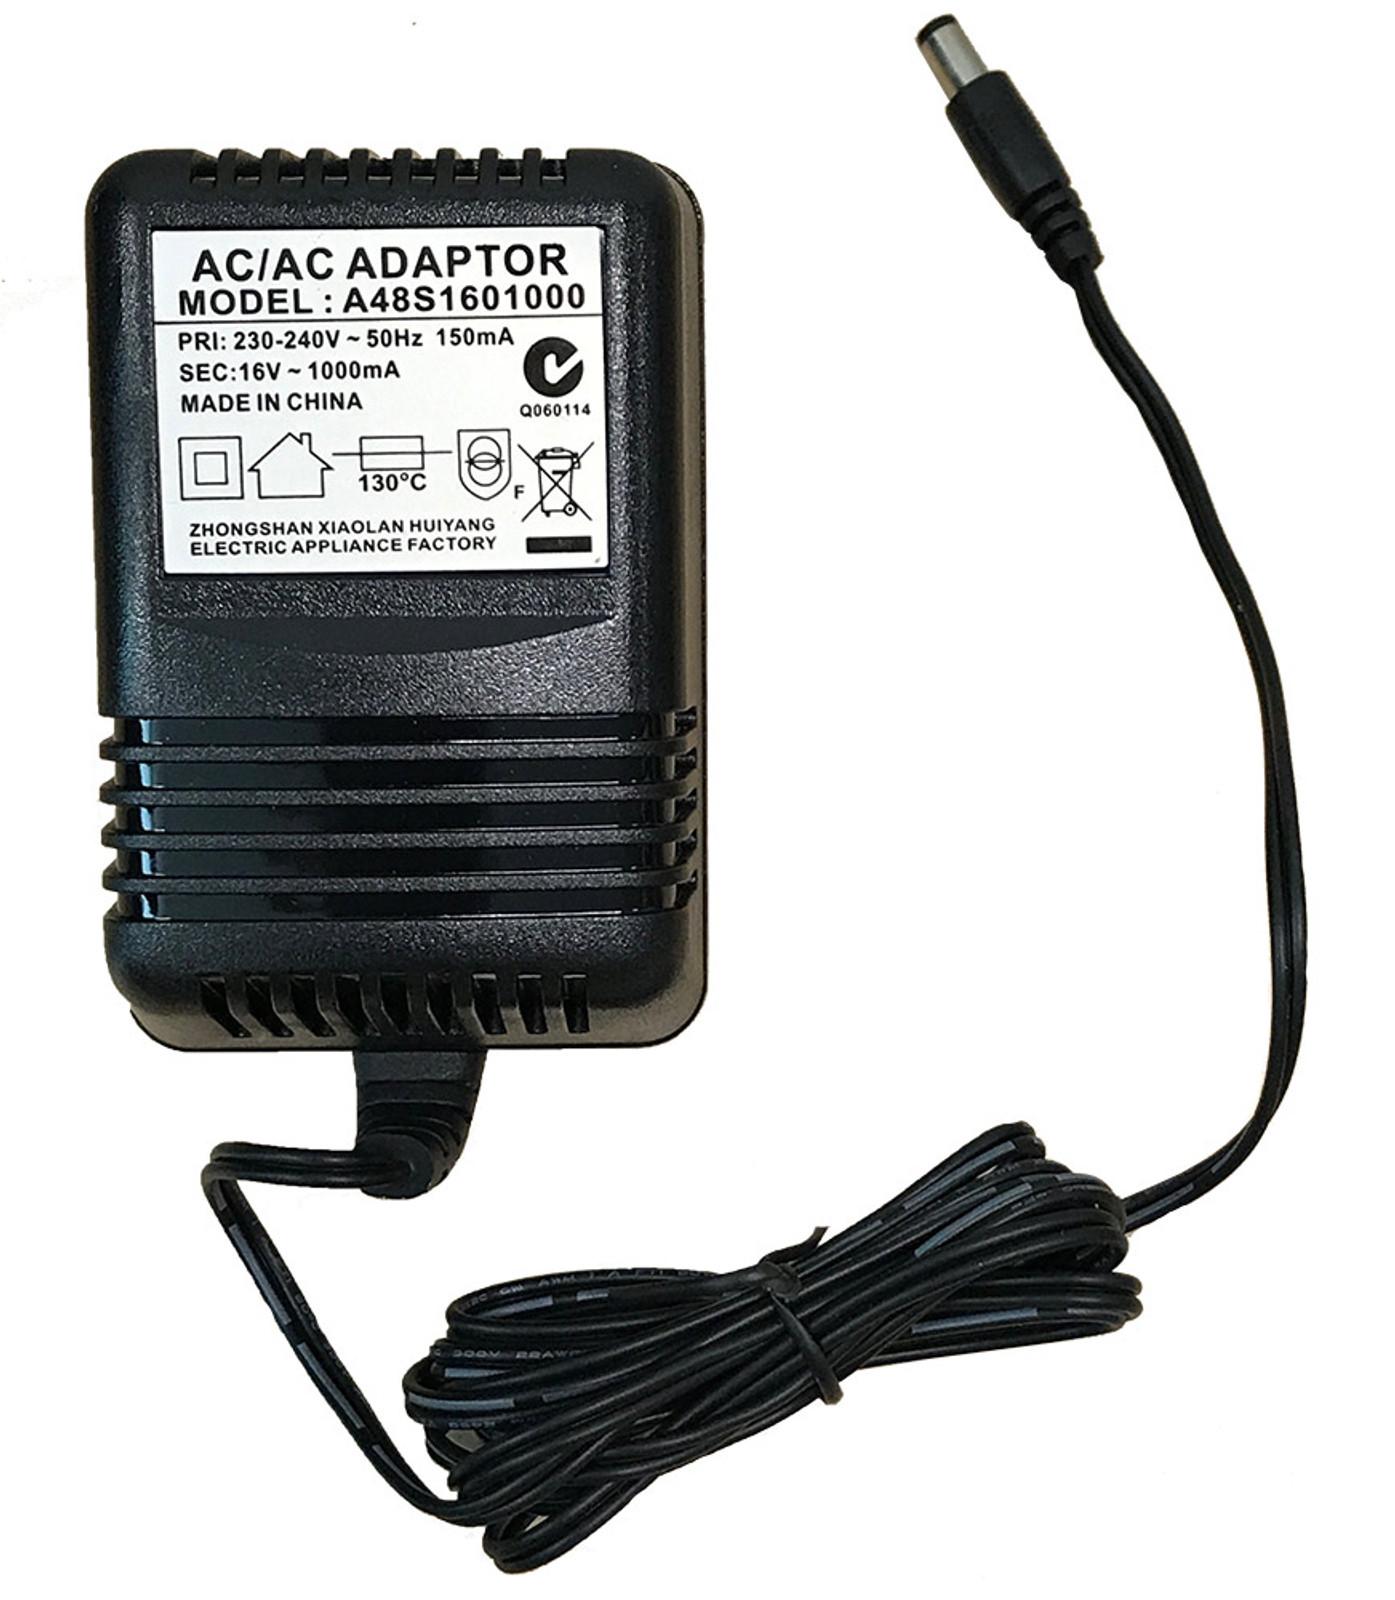 PreSonus power supply for Studio Channel